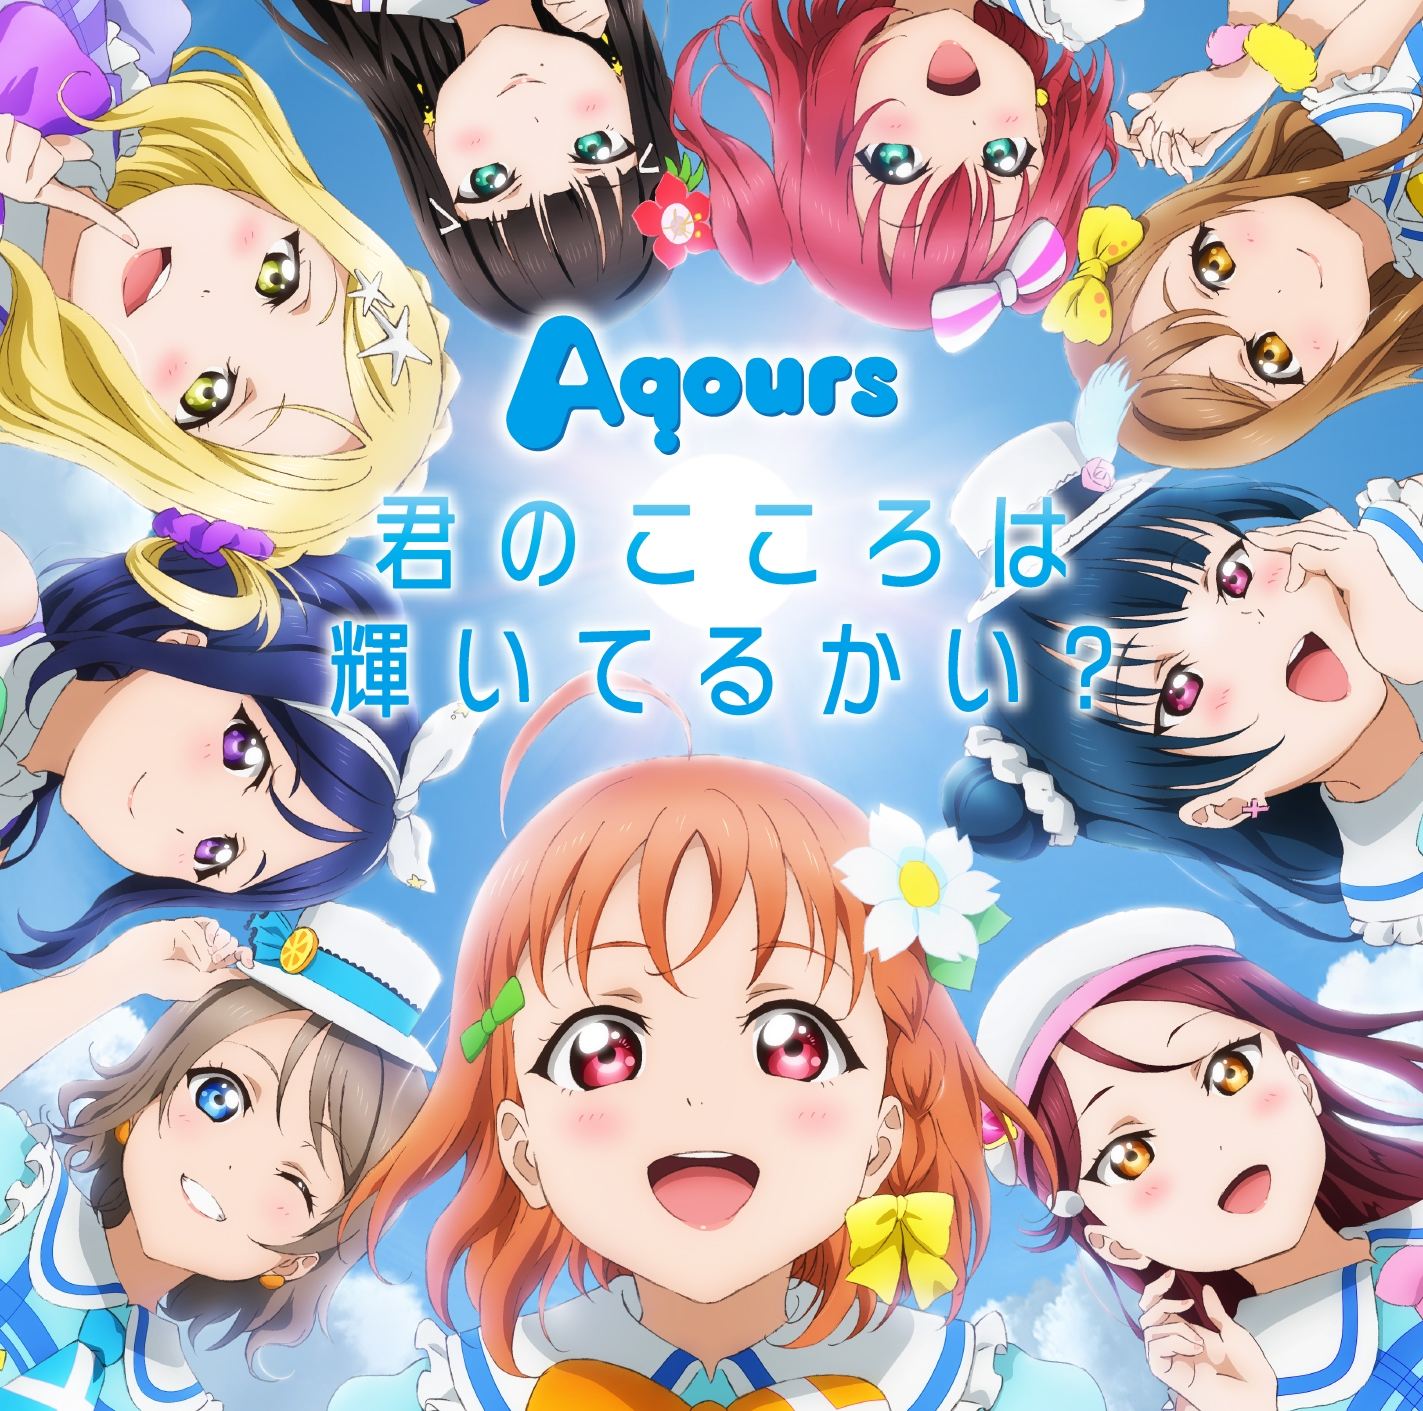 Category:Discography:Aqours | Love Live! Wiki | FANDOM powered by Wikia